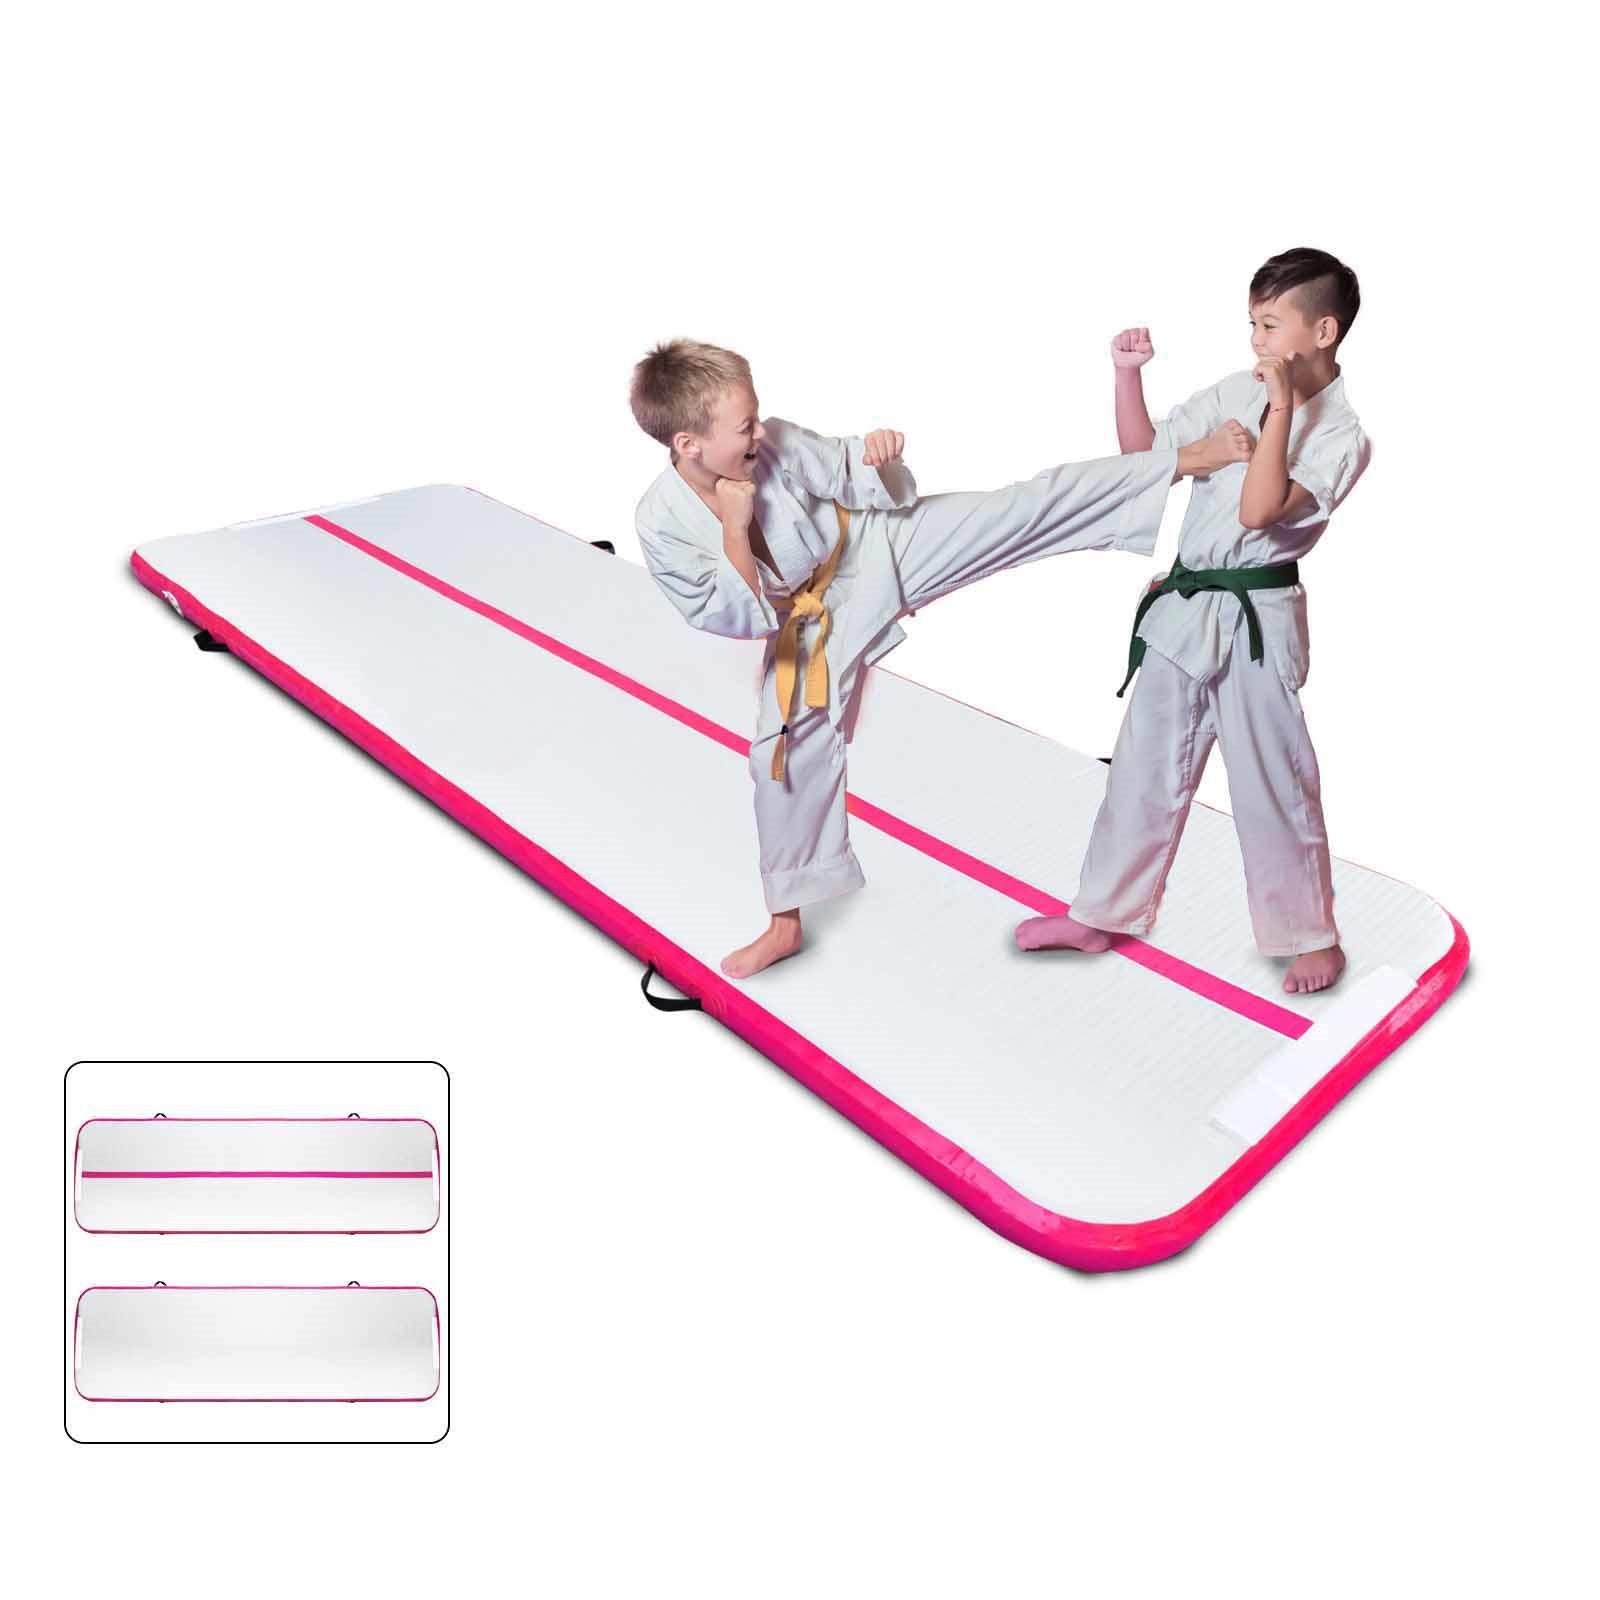 Air-Track-10x3FT-Trumbling-Airtrack-Gymnastics-Yoga-Floor-Mat-Training-Pad-Home thumbnail 107